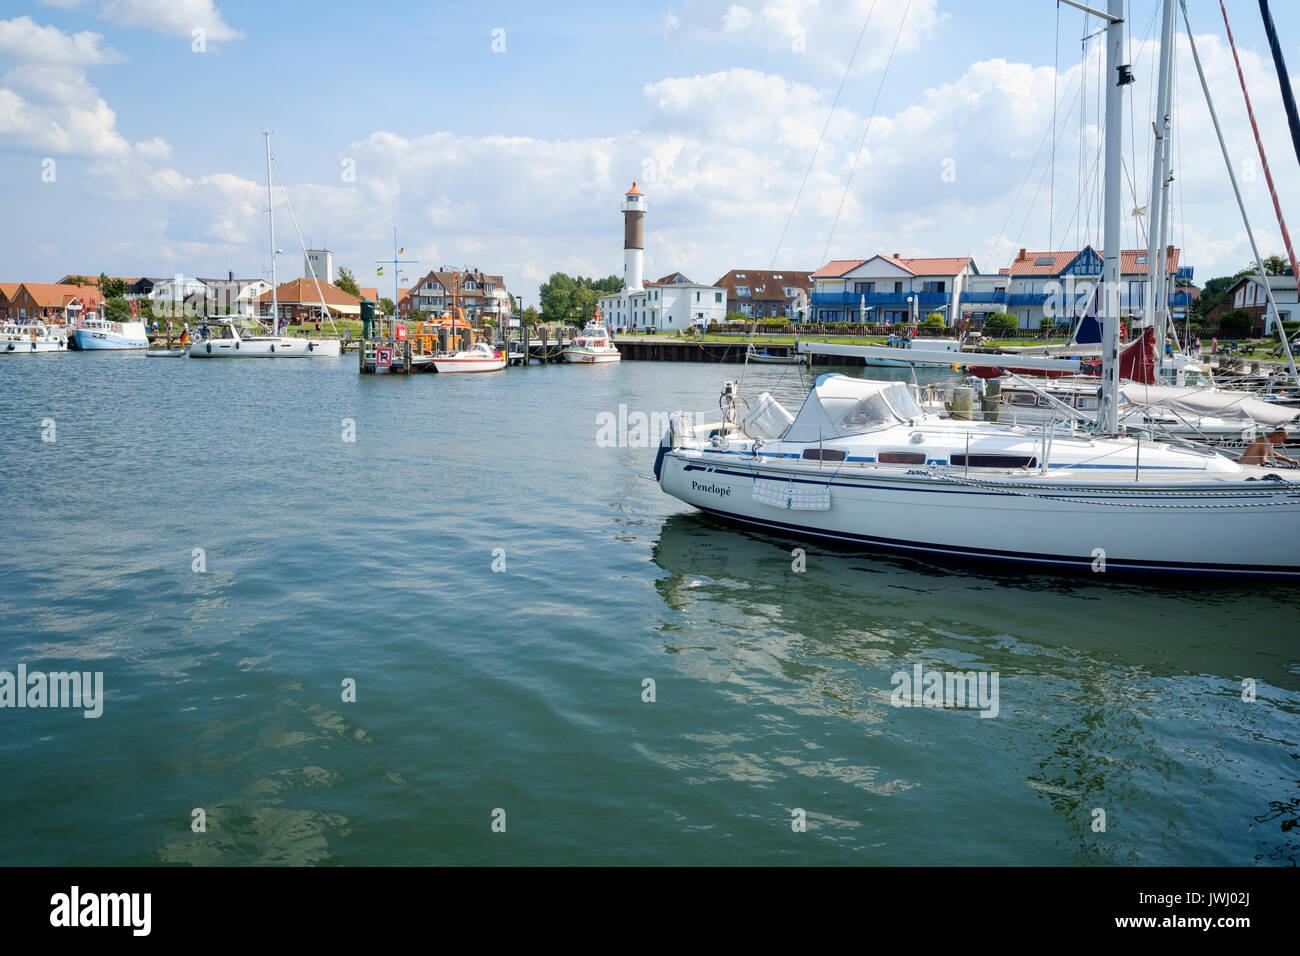 Timmendorf Harbour and Lighthouse, Poel, Mecklenburg-Vorpommern, Germany - Stock Image